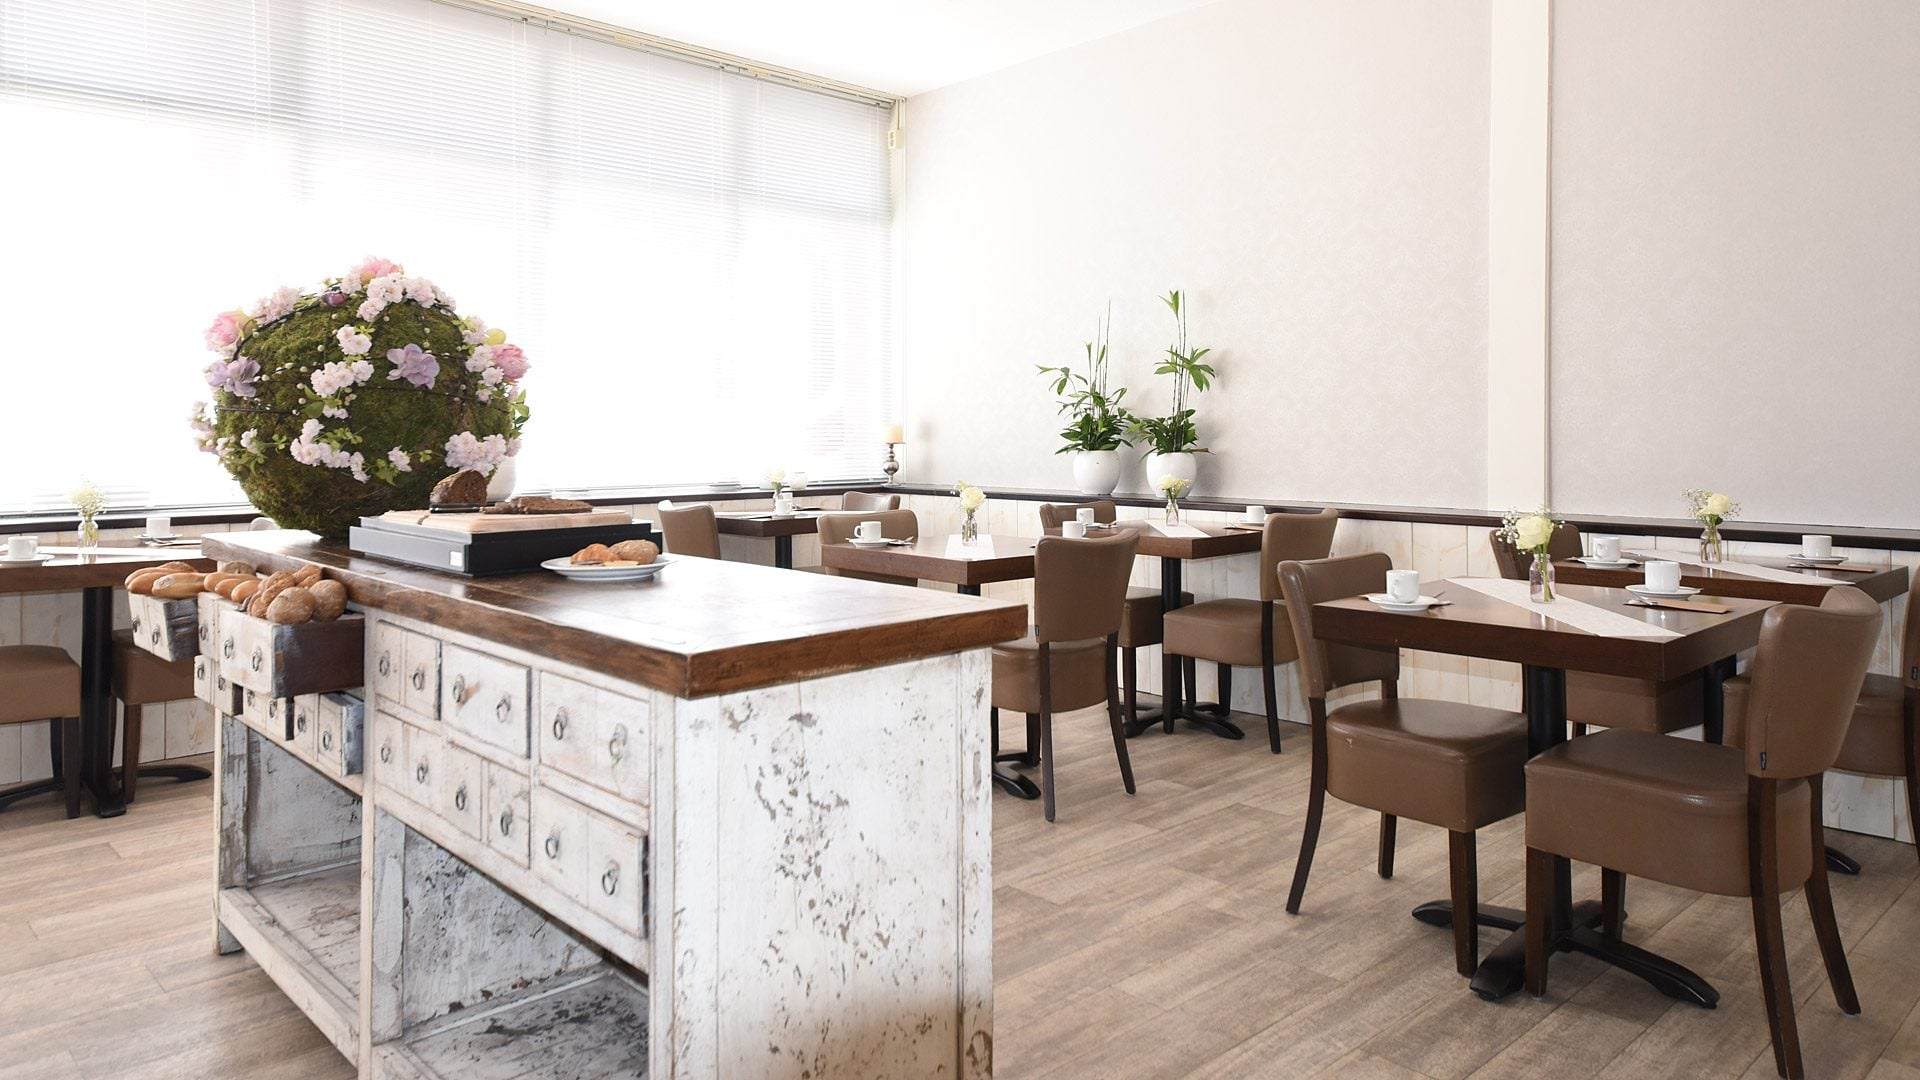 Ontbijt - Hotel Nehalennia